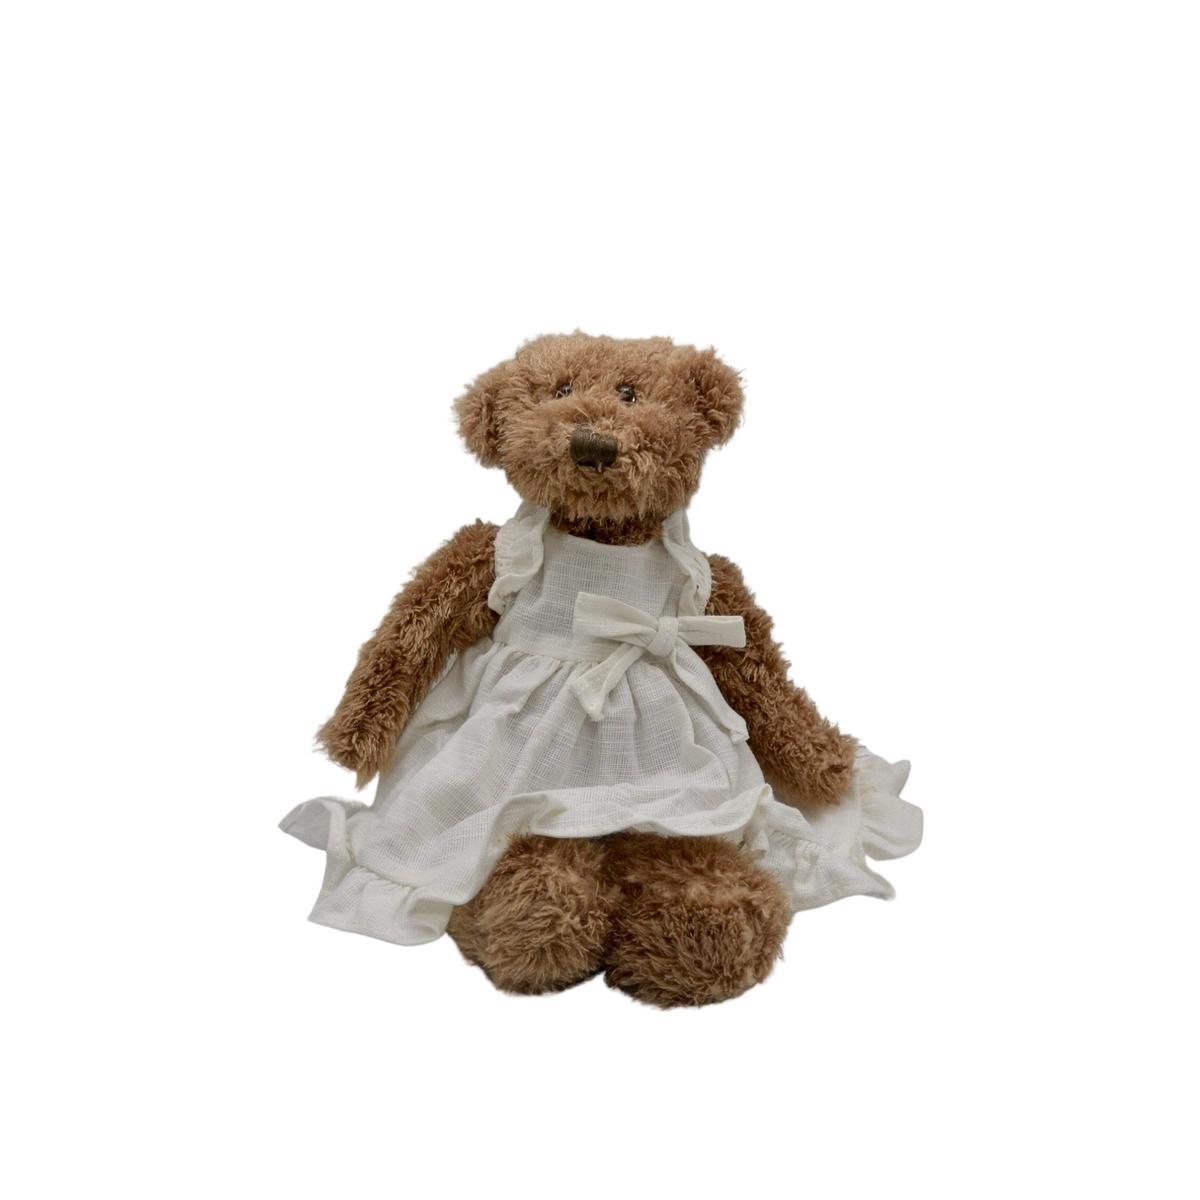 Ourse en peluche avec robe écrue en lin : Suzanne